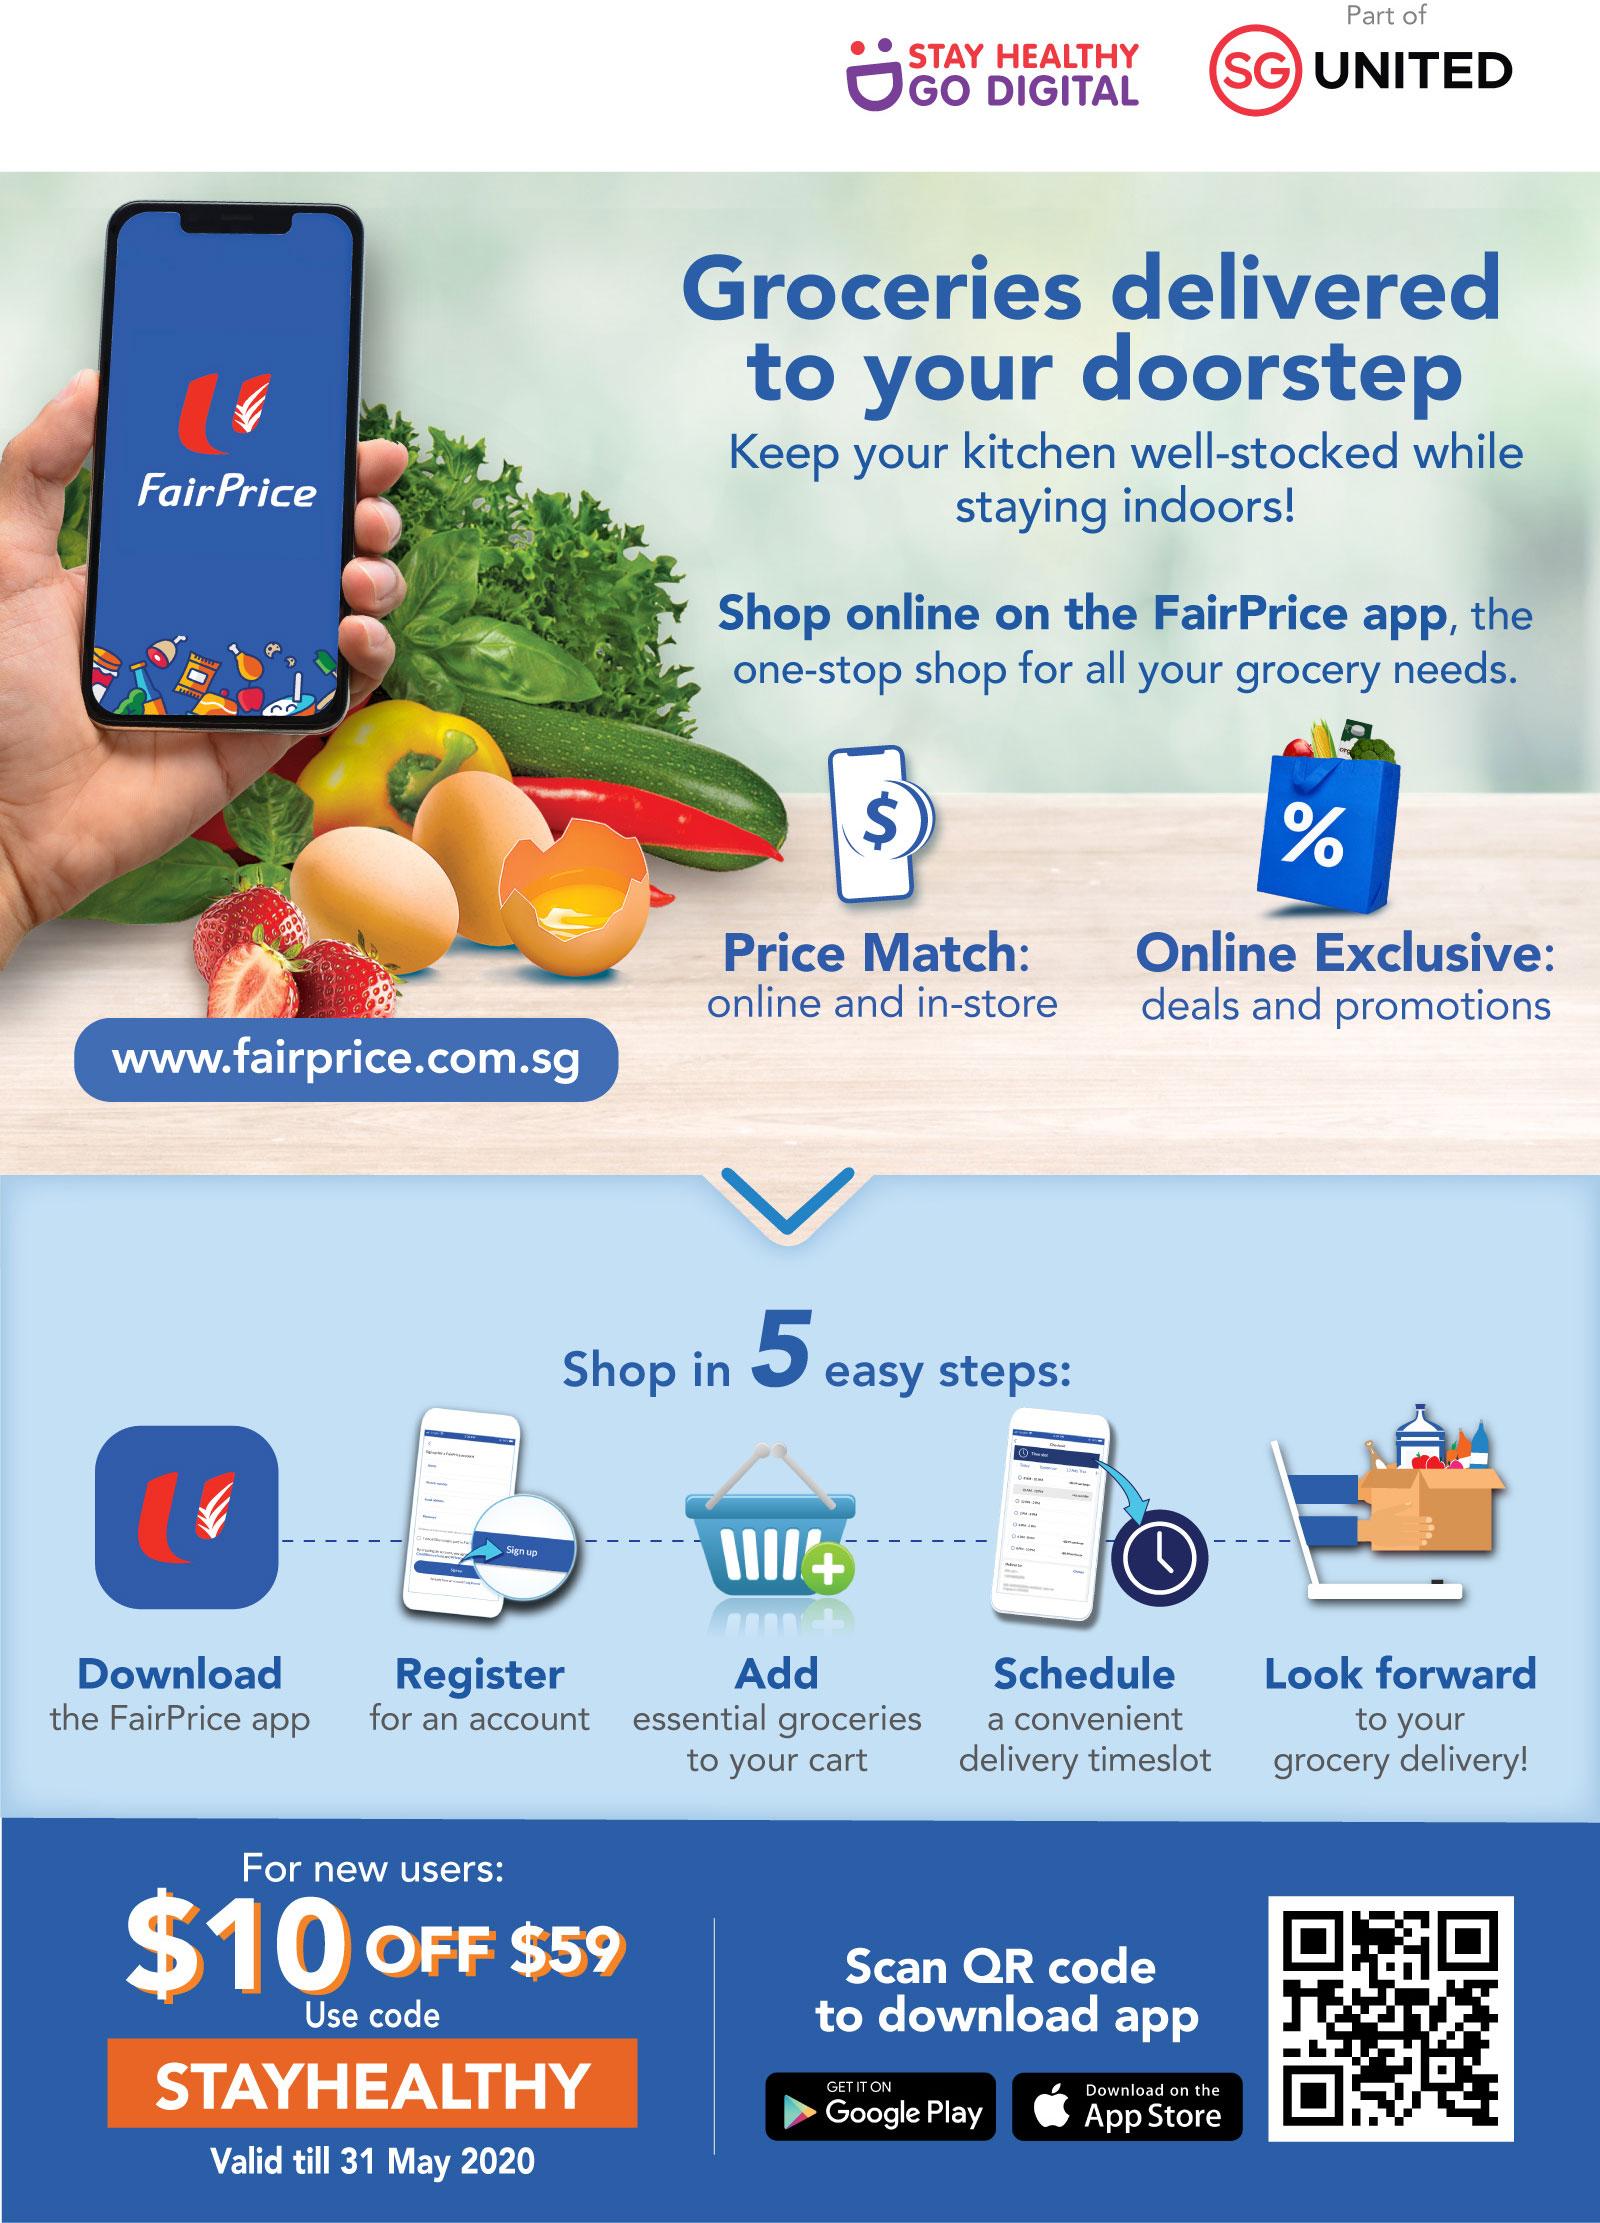 IMDA - Stay Healthy, Go Digital!